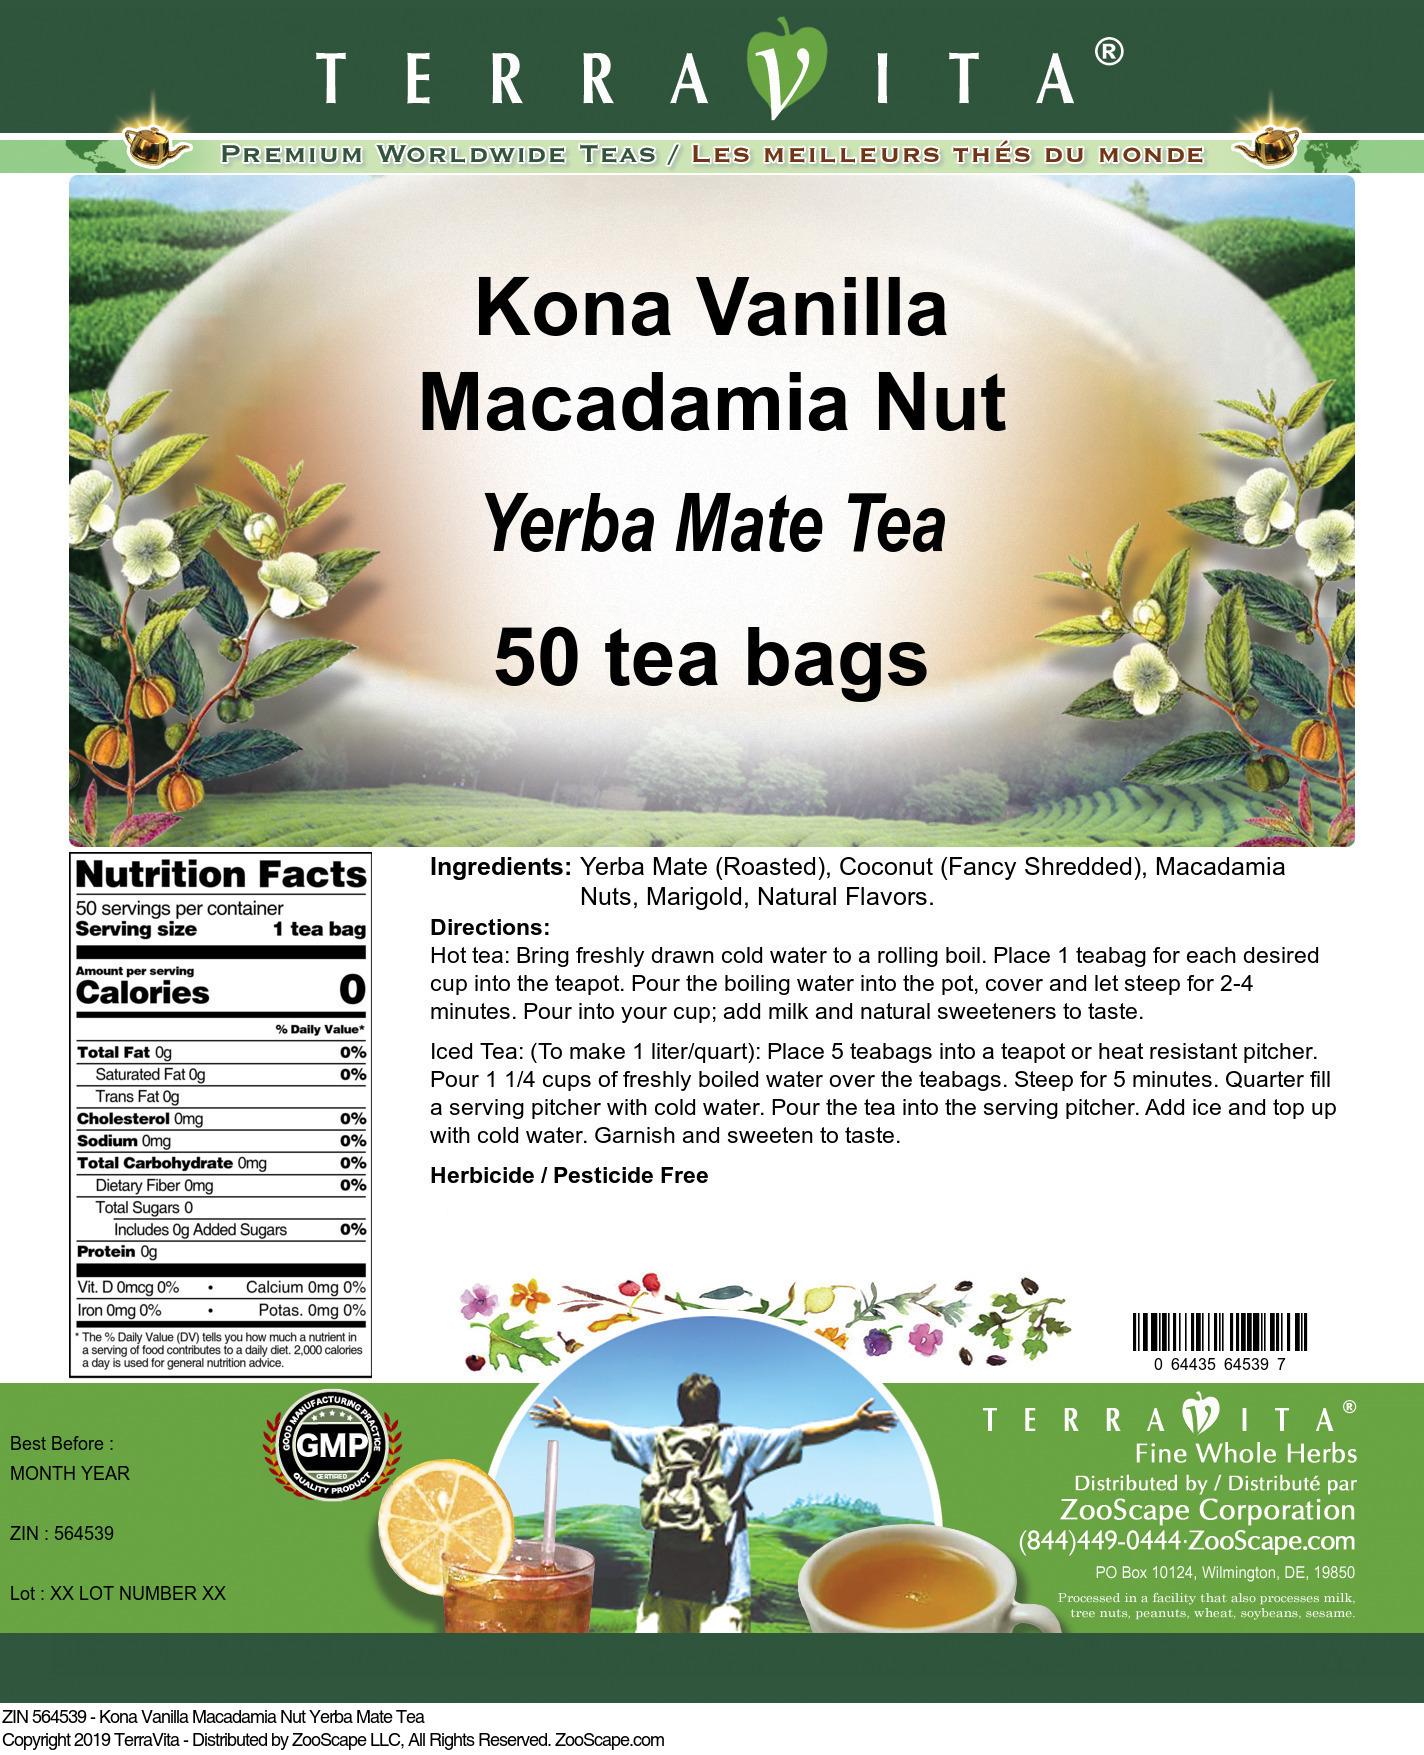 Kona Vanilla Macadamia Nut Yerba Mate Tea